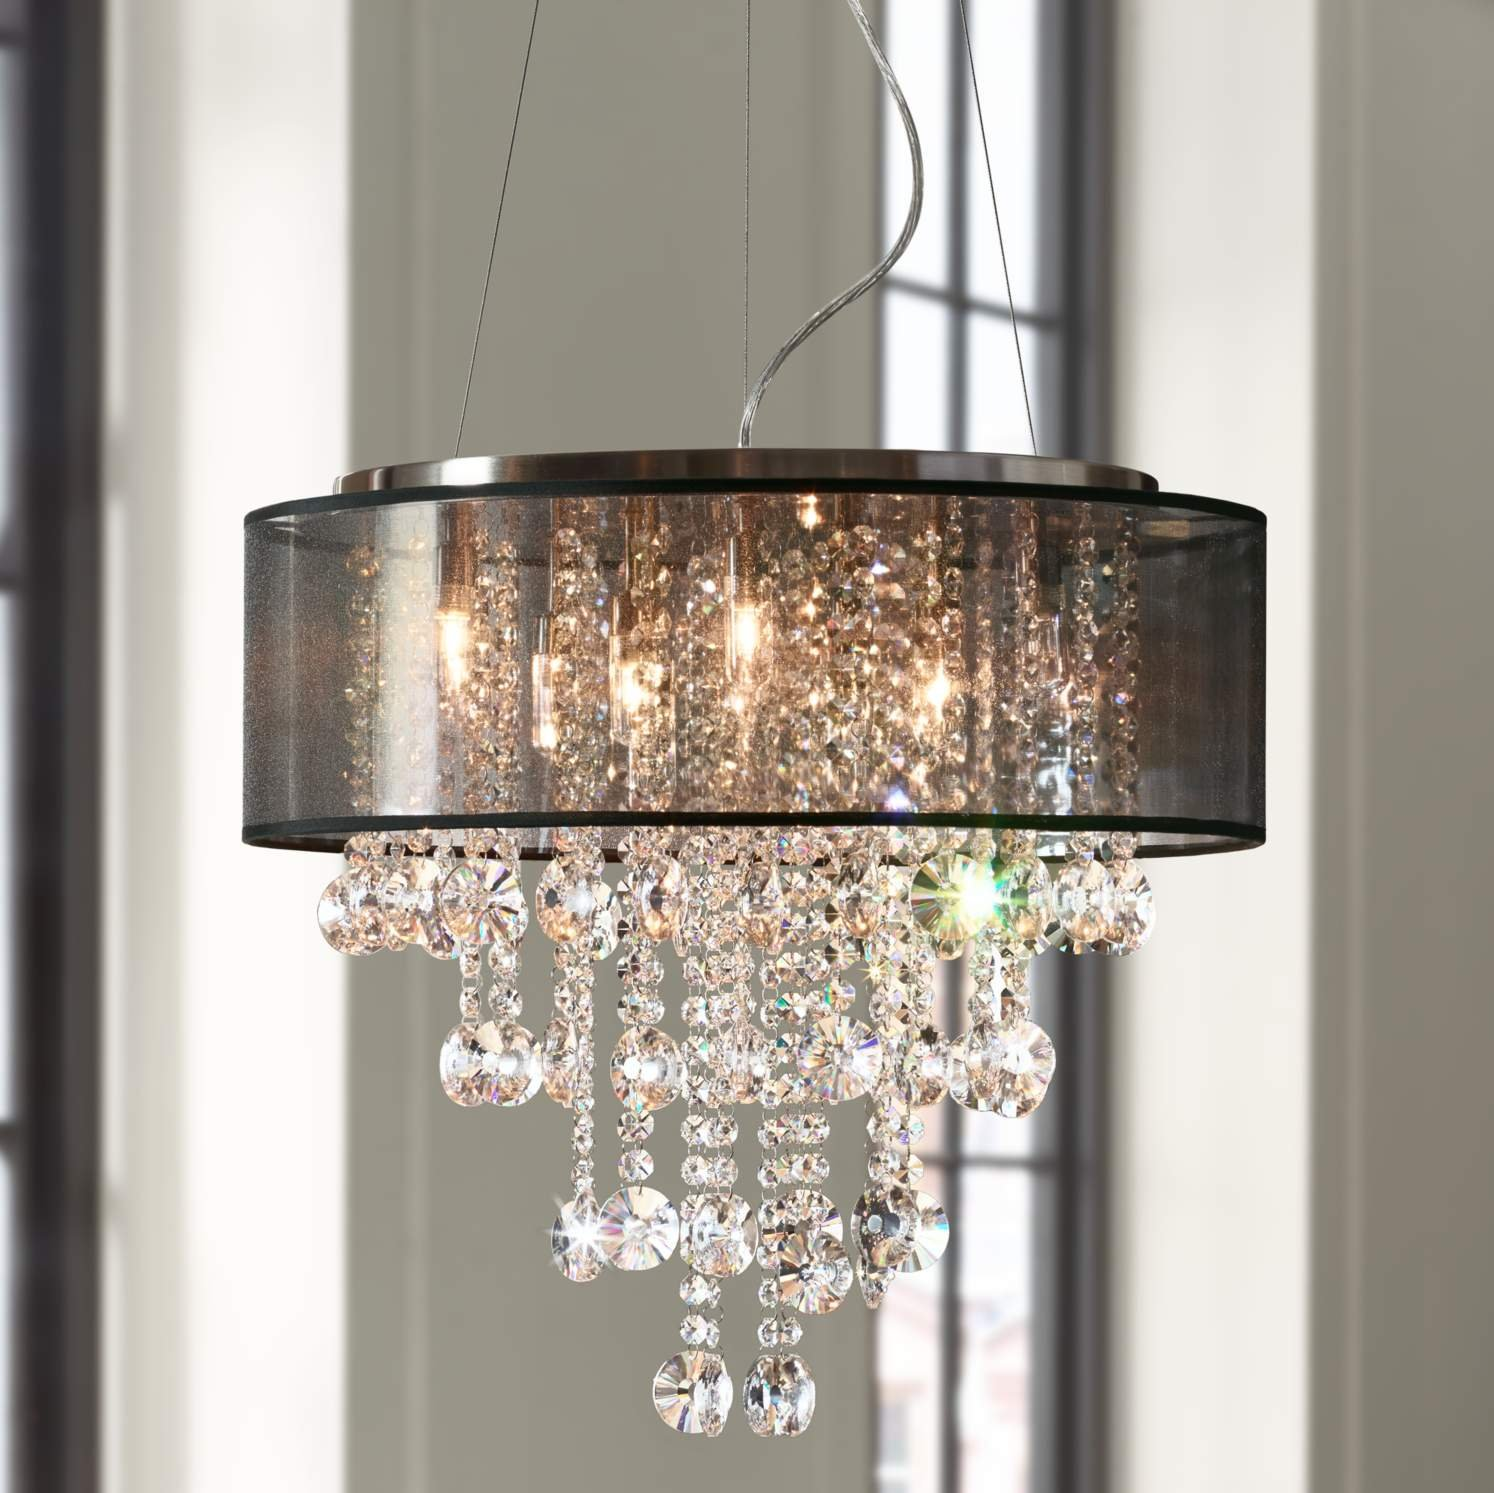 Saint Mossi Chrome Modern K9 Crystal Chandelier Lighting LED Ceiling Light Fixture Pendant Lamp for Dining Room Bathroom Bedroom Livingroom 7G9 Bulbs Required H19'' W22''